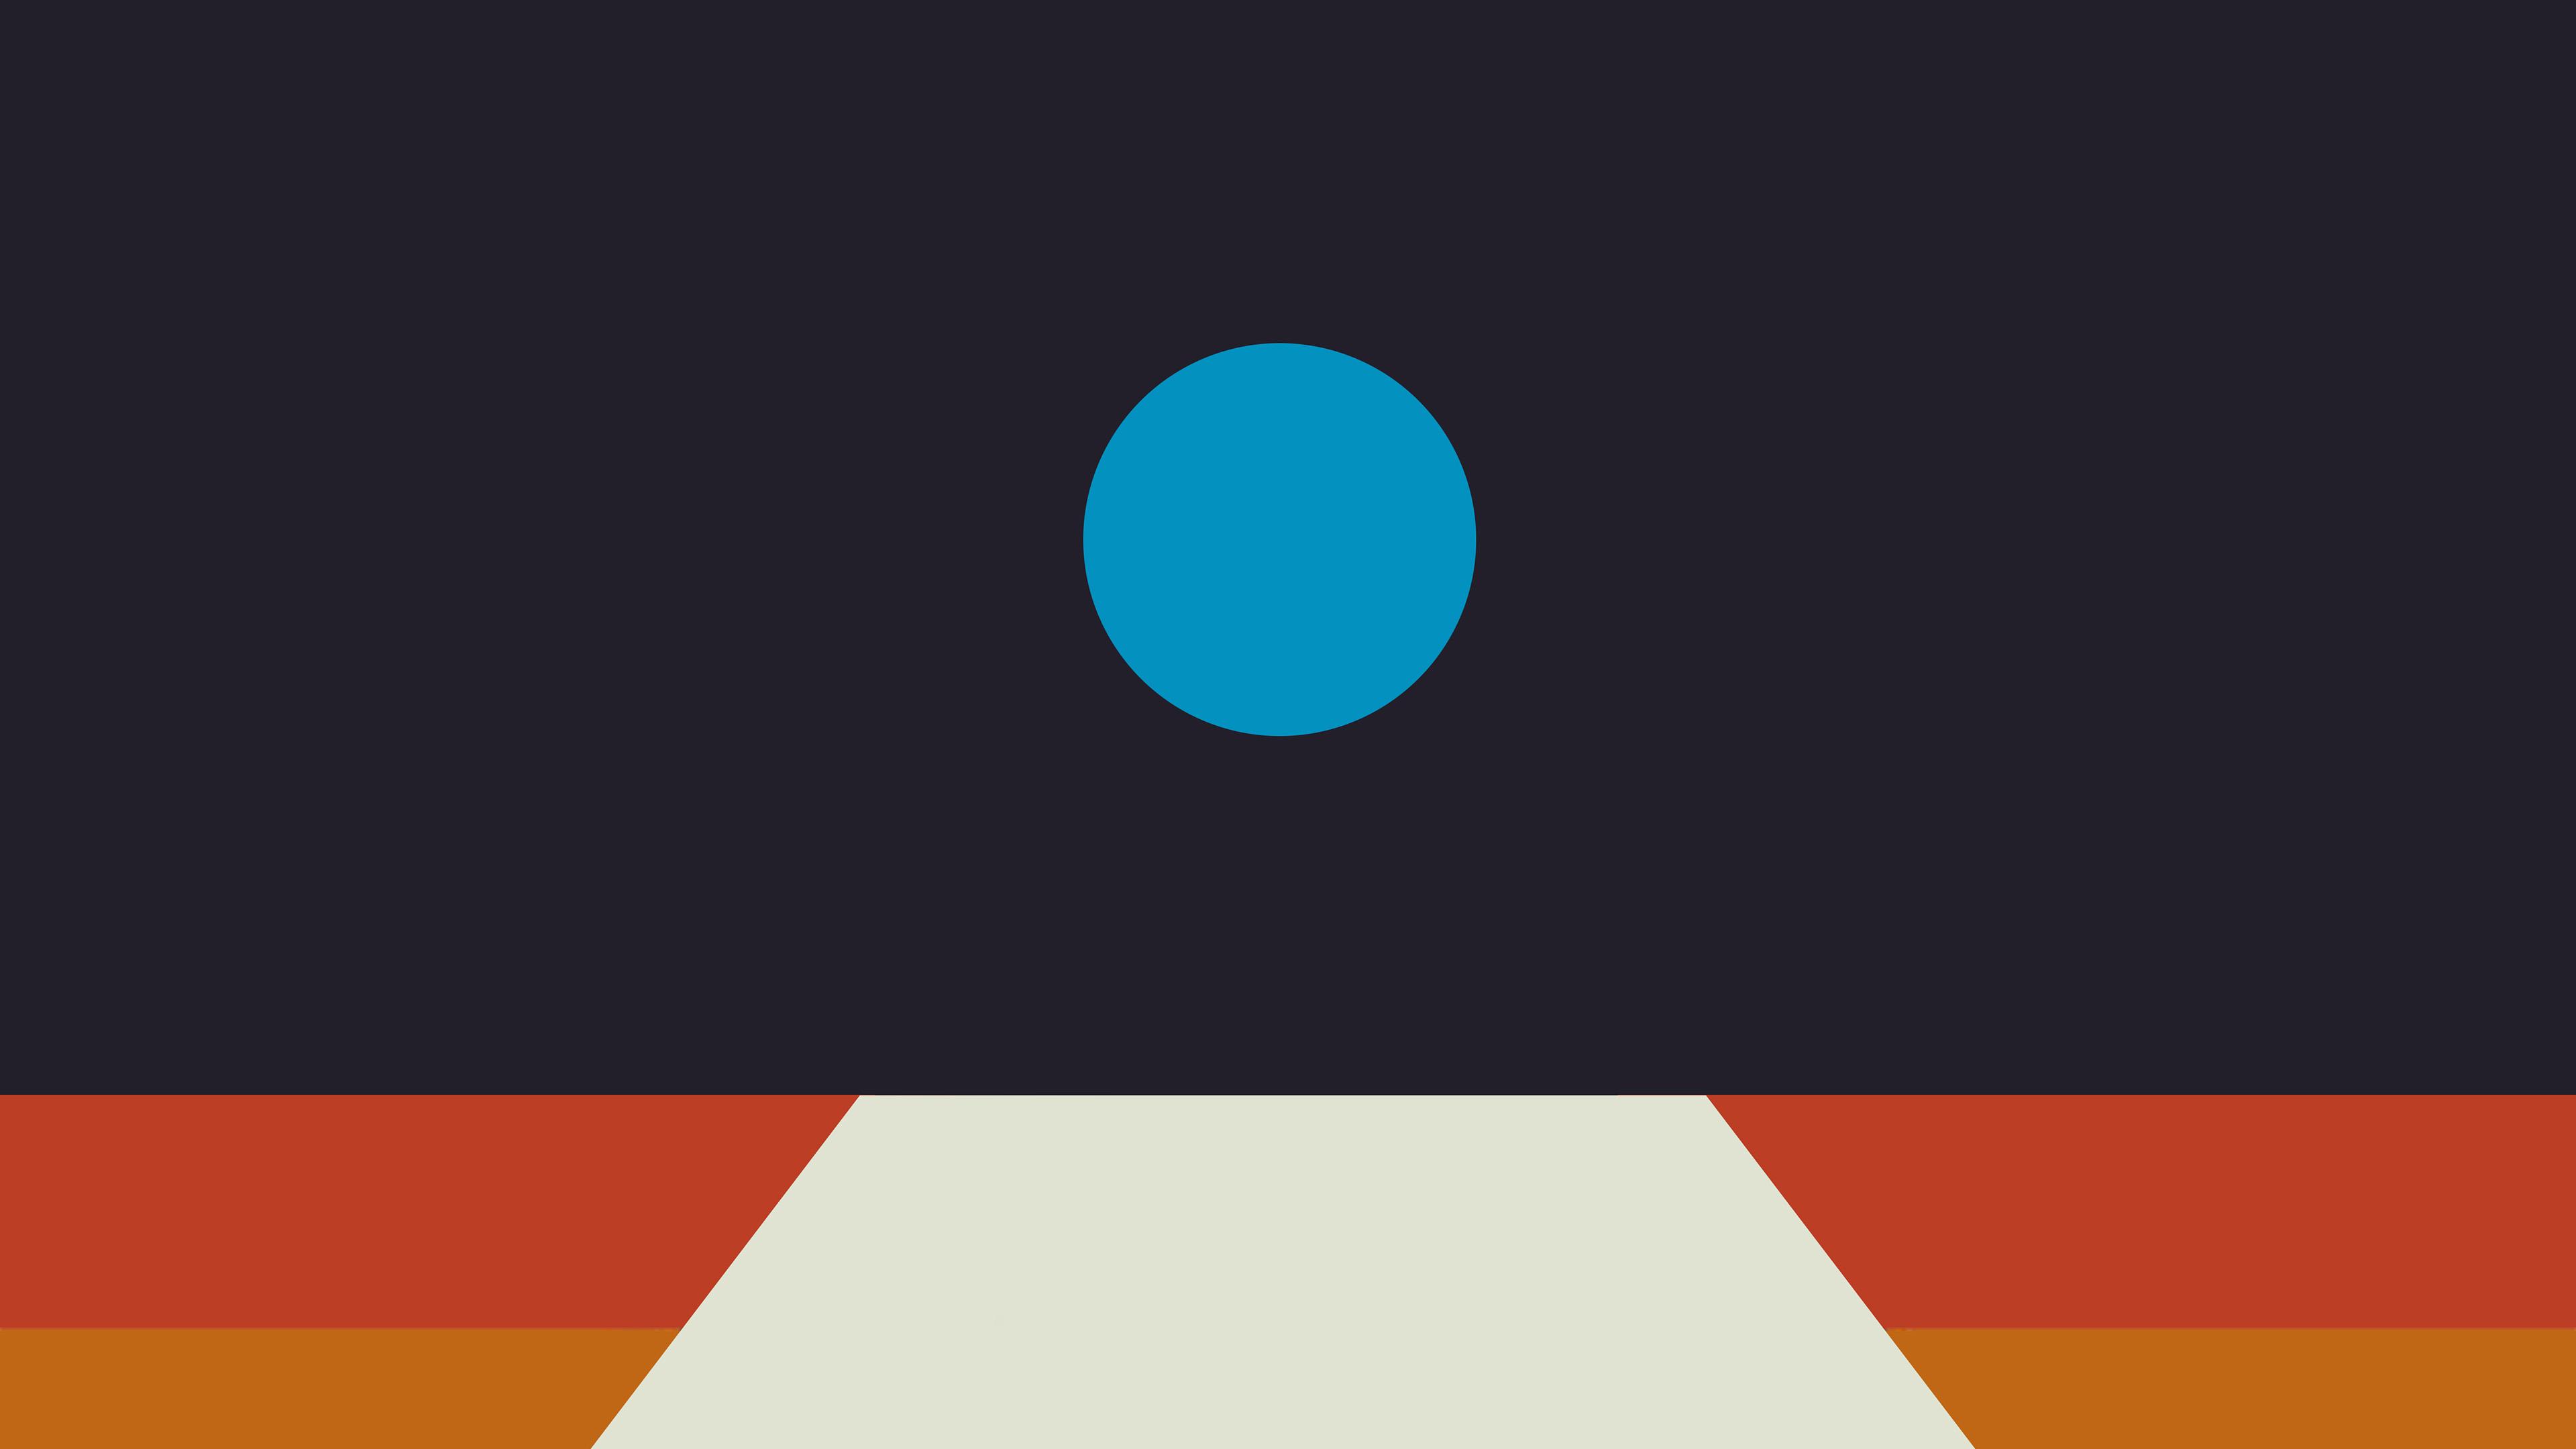 Minimalist Abstract Desktop Wallpaper 4k 3840x2160 Wallpaper Teahub Io